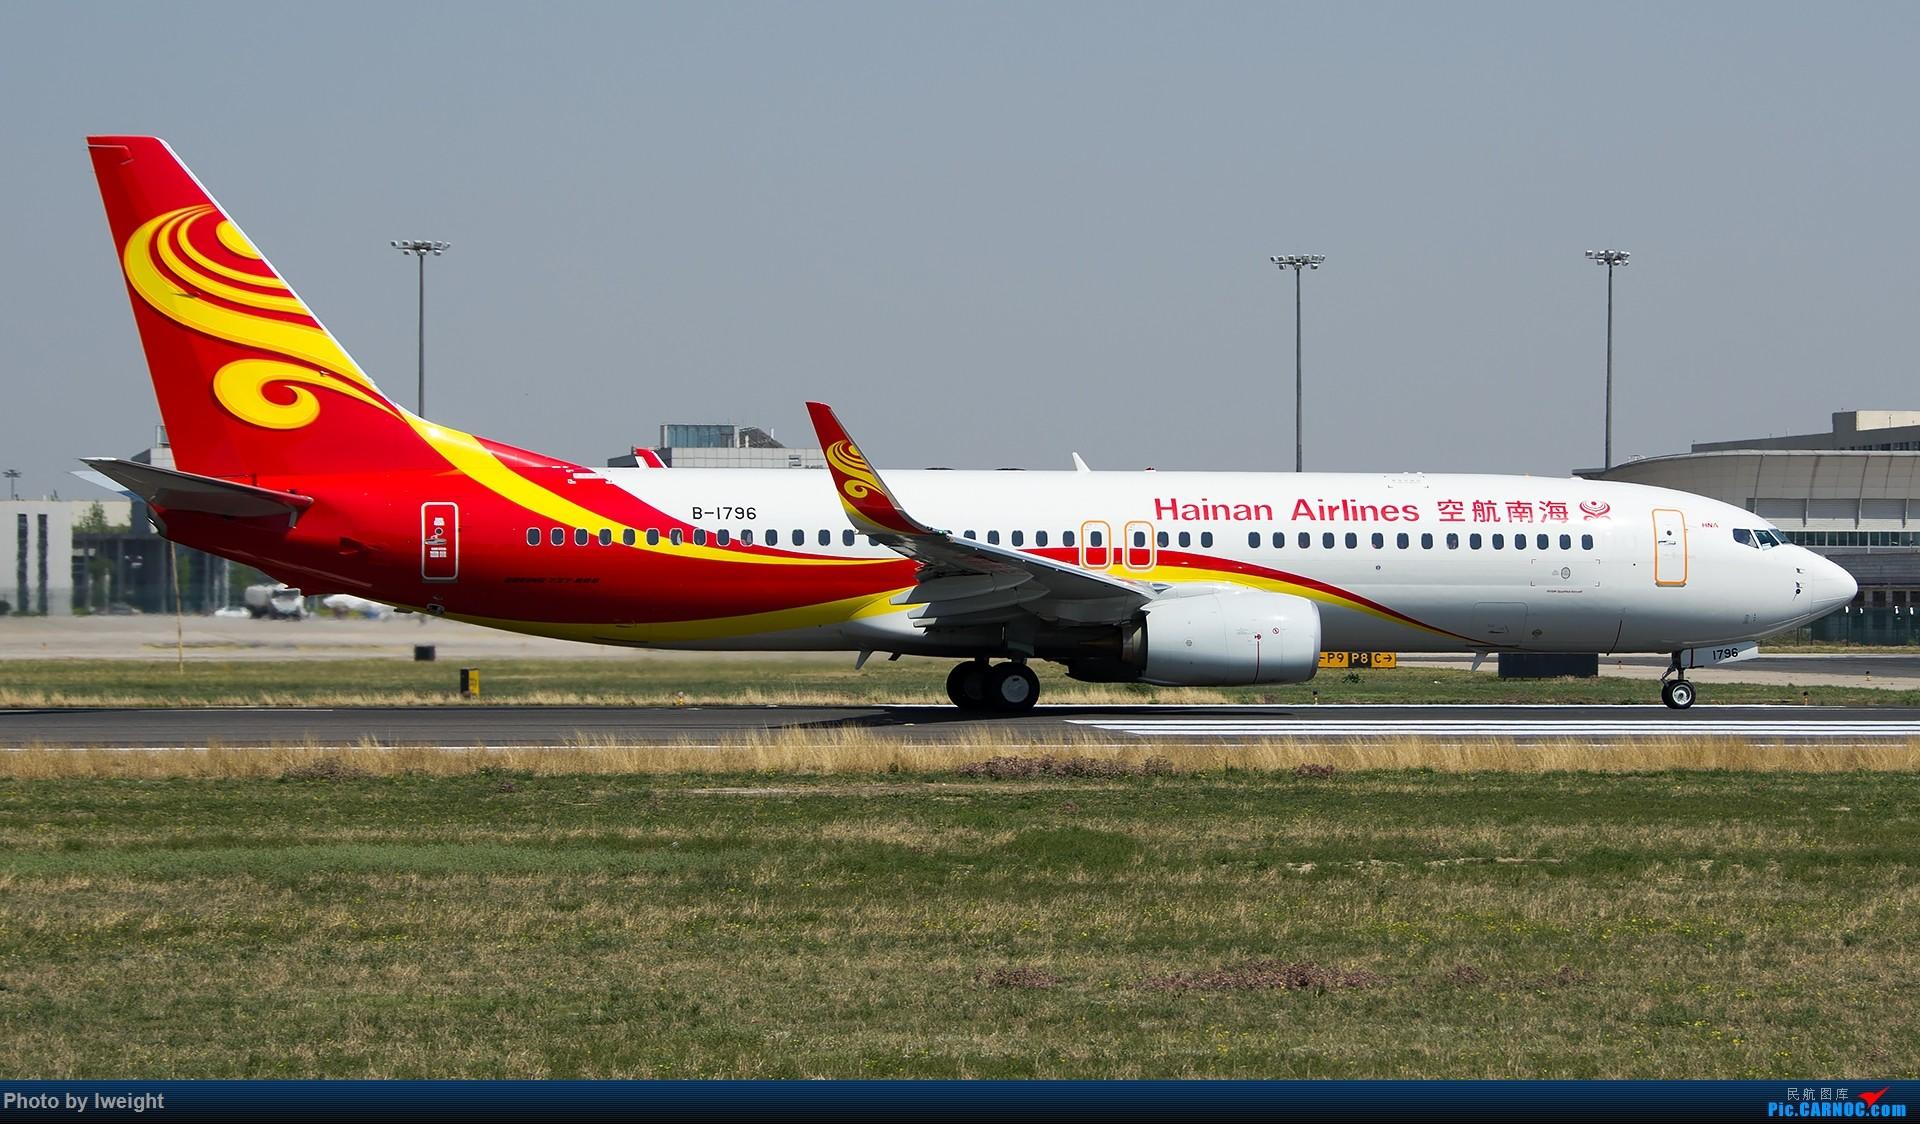 Re:[原创]2015年第一次在PEK拍北向南,其实是为Jimmy去的【2015-4-24】 BOEING 737-800 B-1796 中国北京首都国际机场